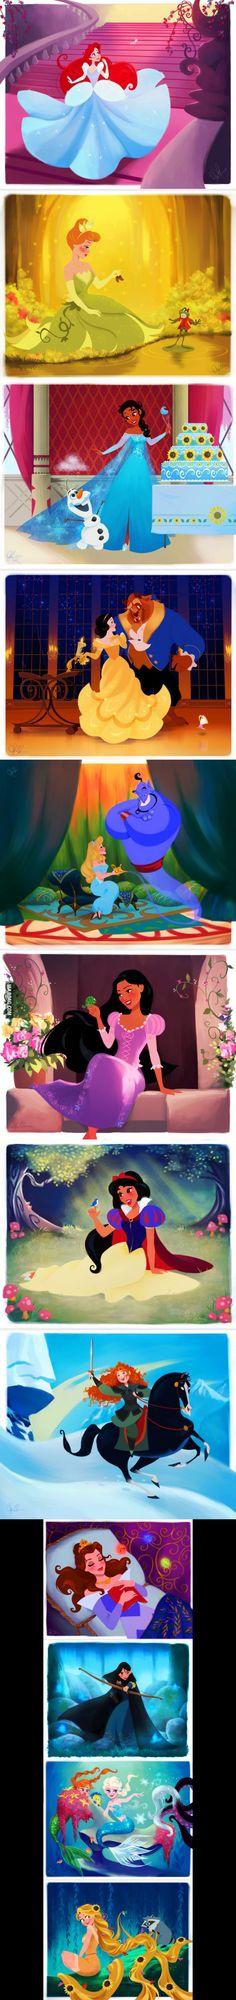 Disney princess dresses, Disney princess Disney, Disney pixar, Disney and dreamworks, Disney princess - Disney Princesses dressed as other Disney Princesses - Disney Pixar, Walt Disney, Disney Punk, Disney Amor, Humor Disney, Disney Fan Art, Cute Disney, Disney Girls, Disney And Dreamworks